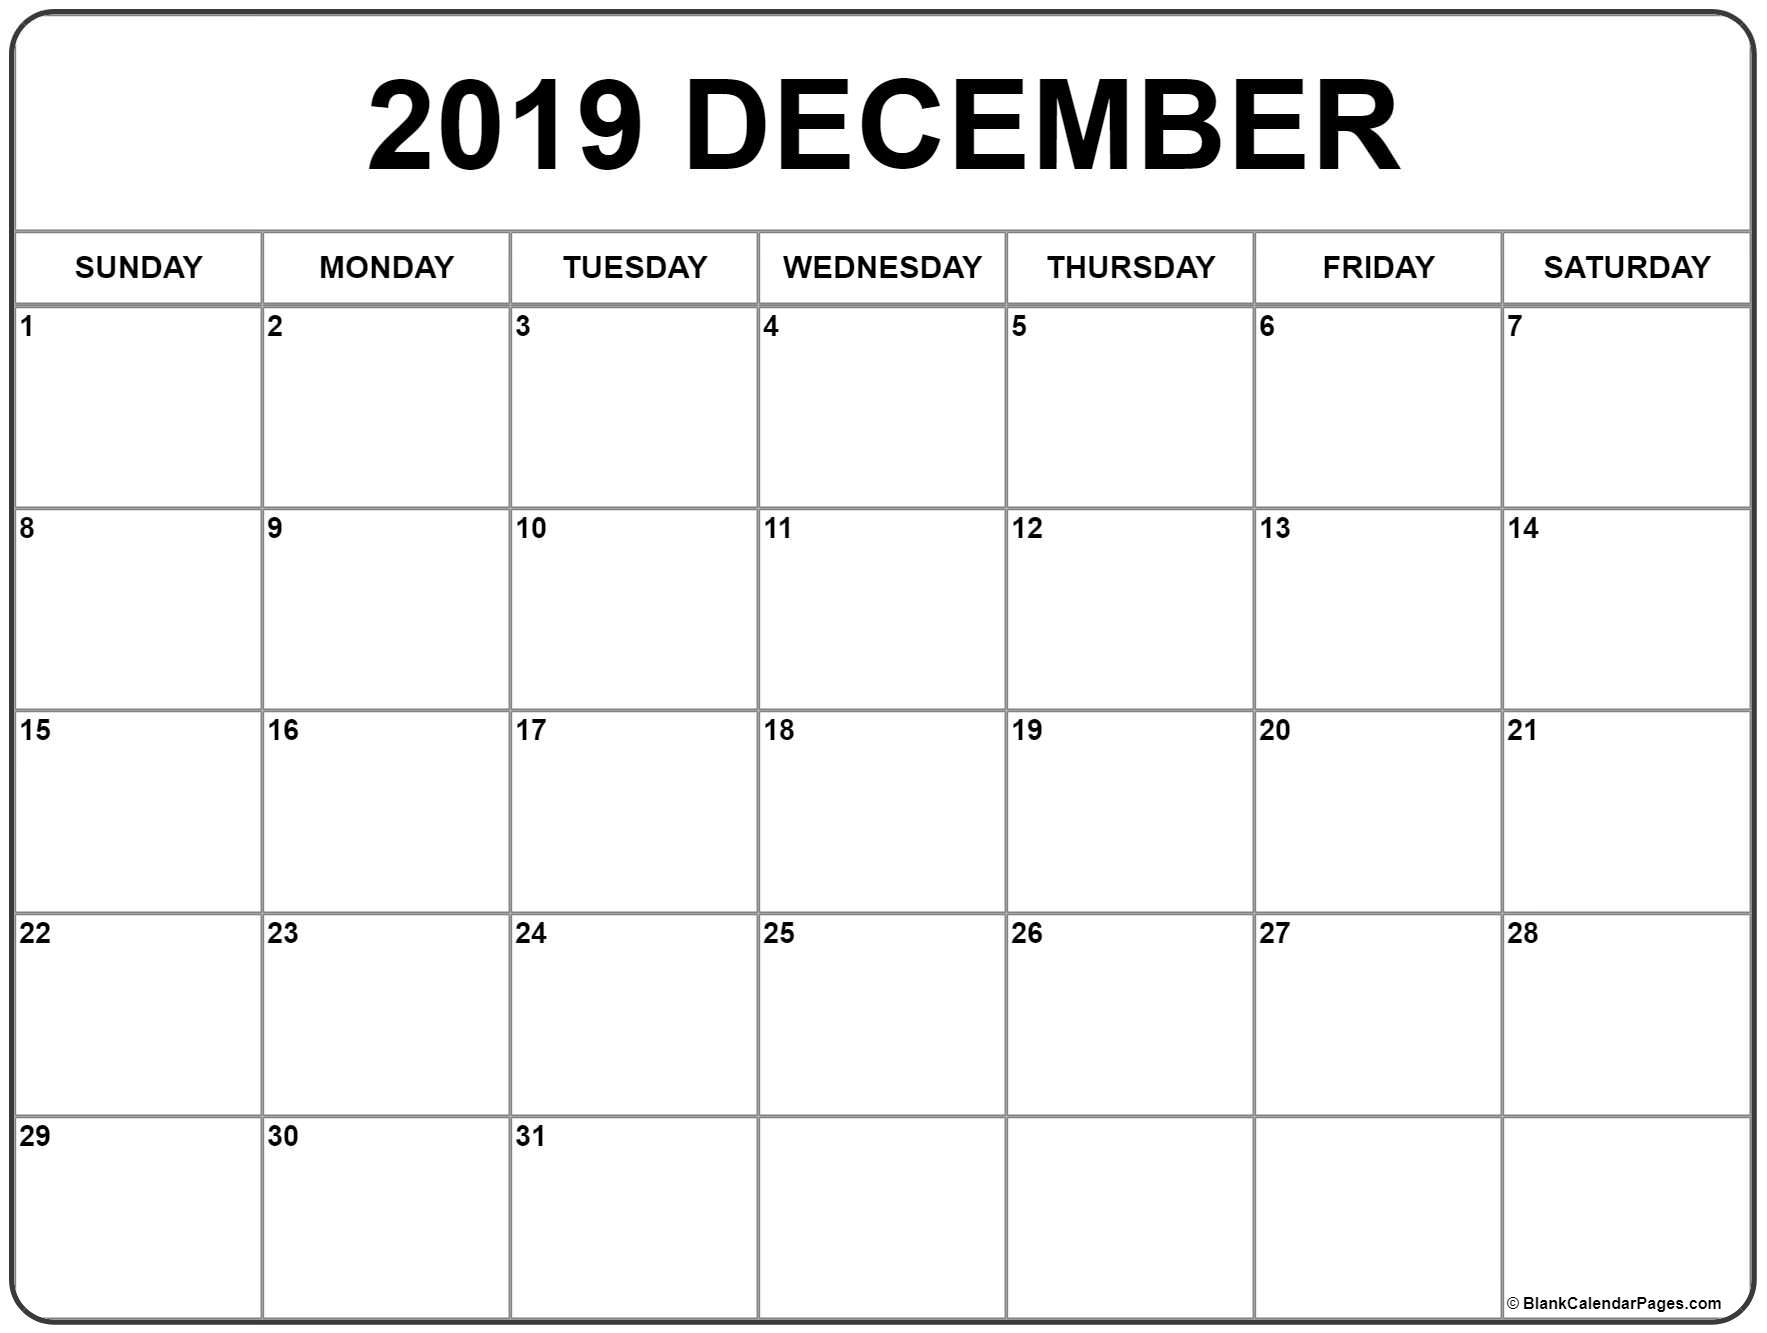 December 2019 Blank Calendar Template